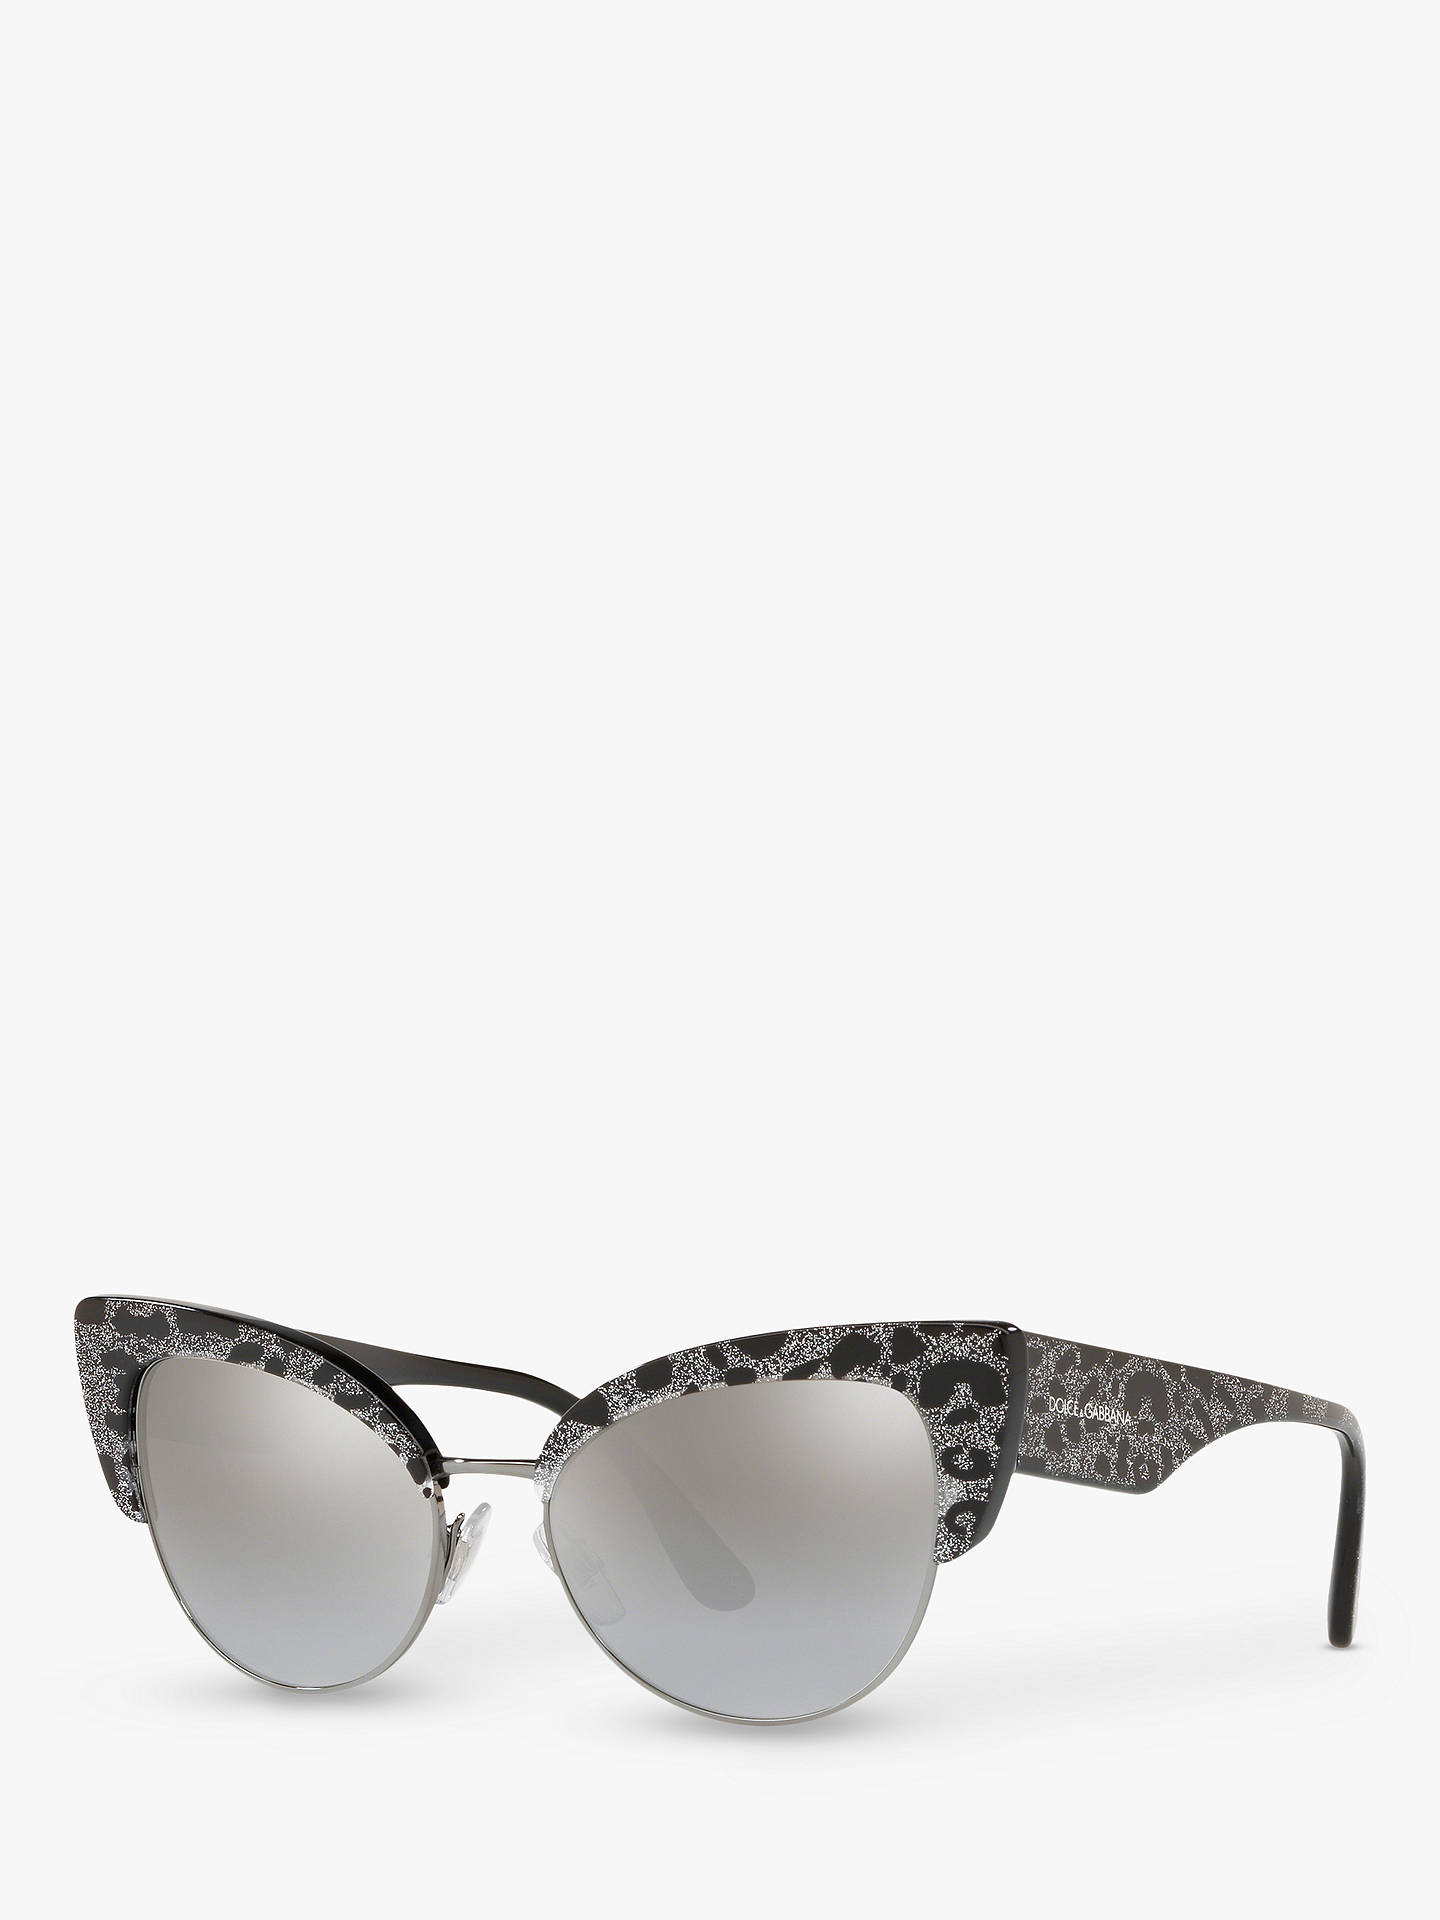 c95bd01392 Dolce   Gabbana DG4346 Women s Cat s Eye Sunglasses at John Lewis ...